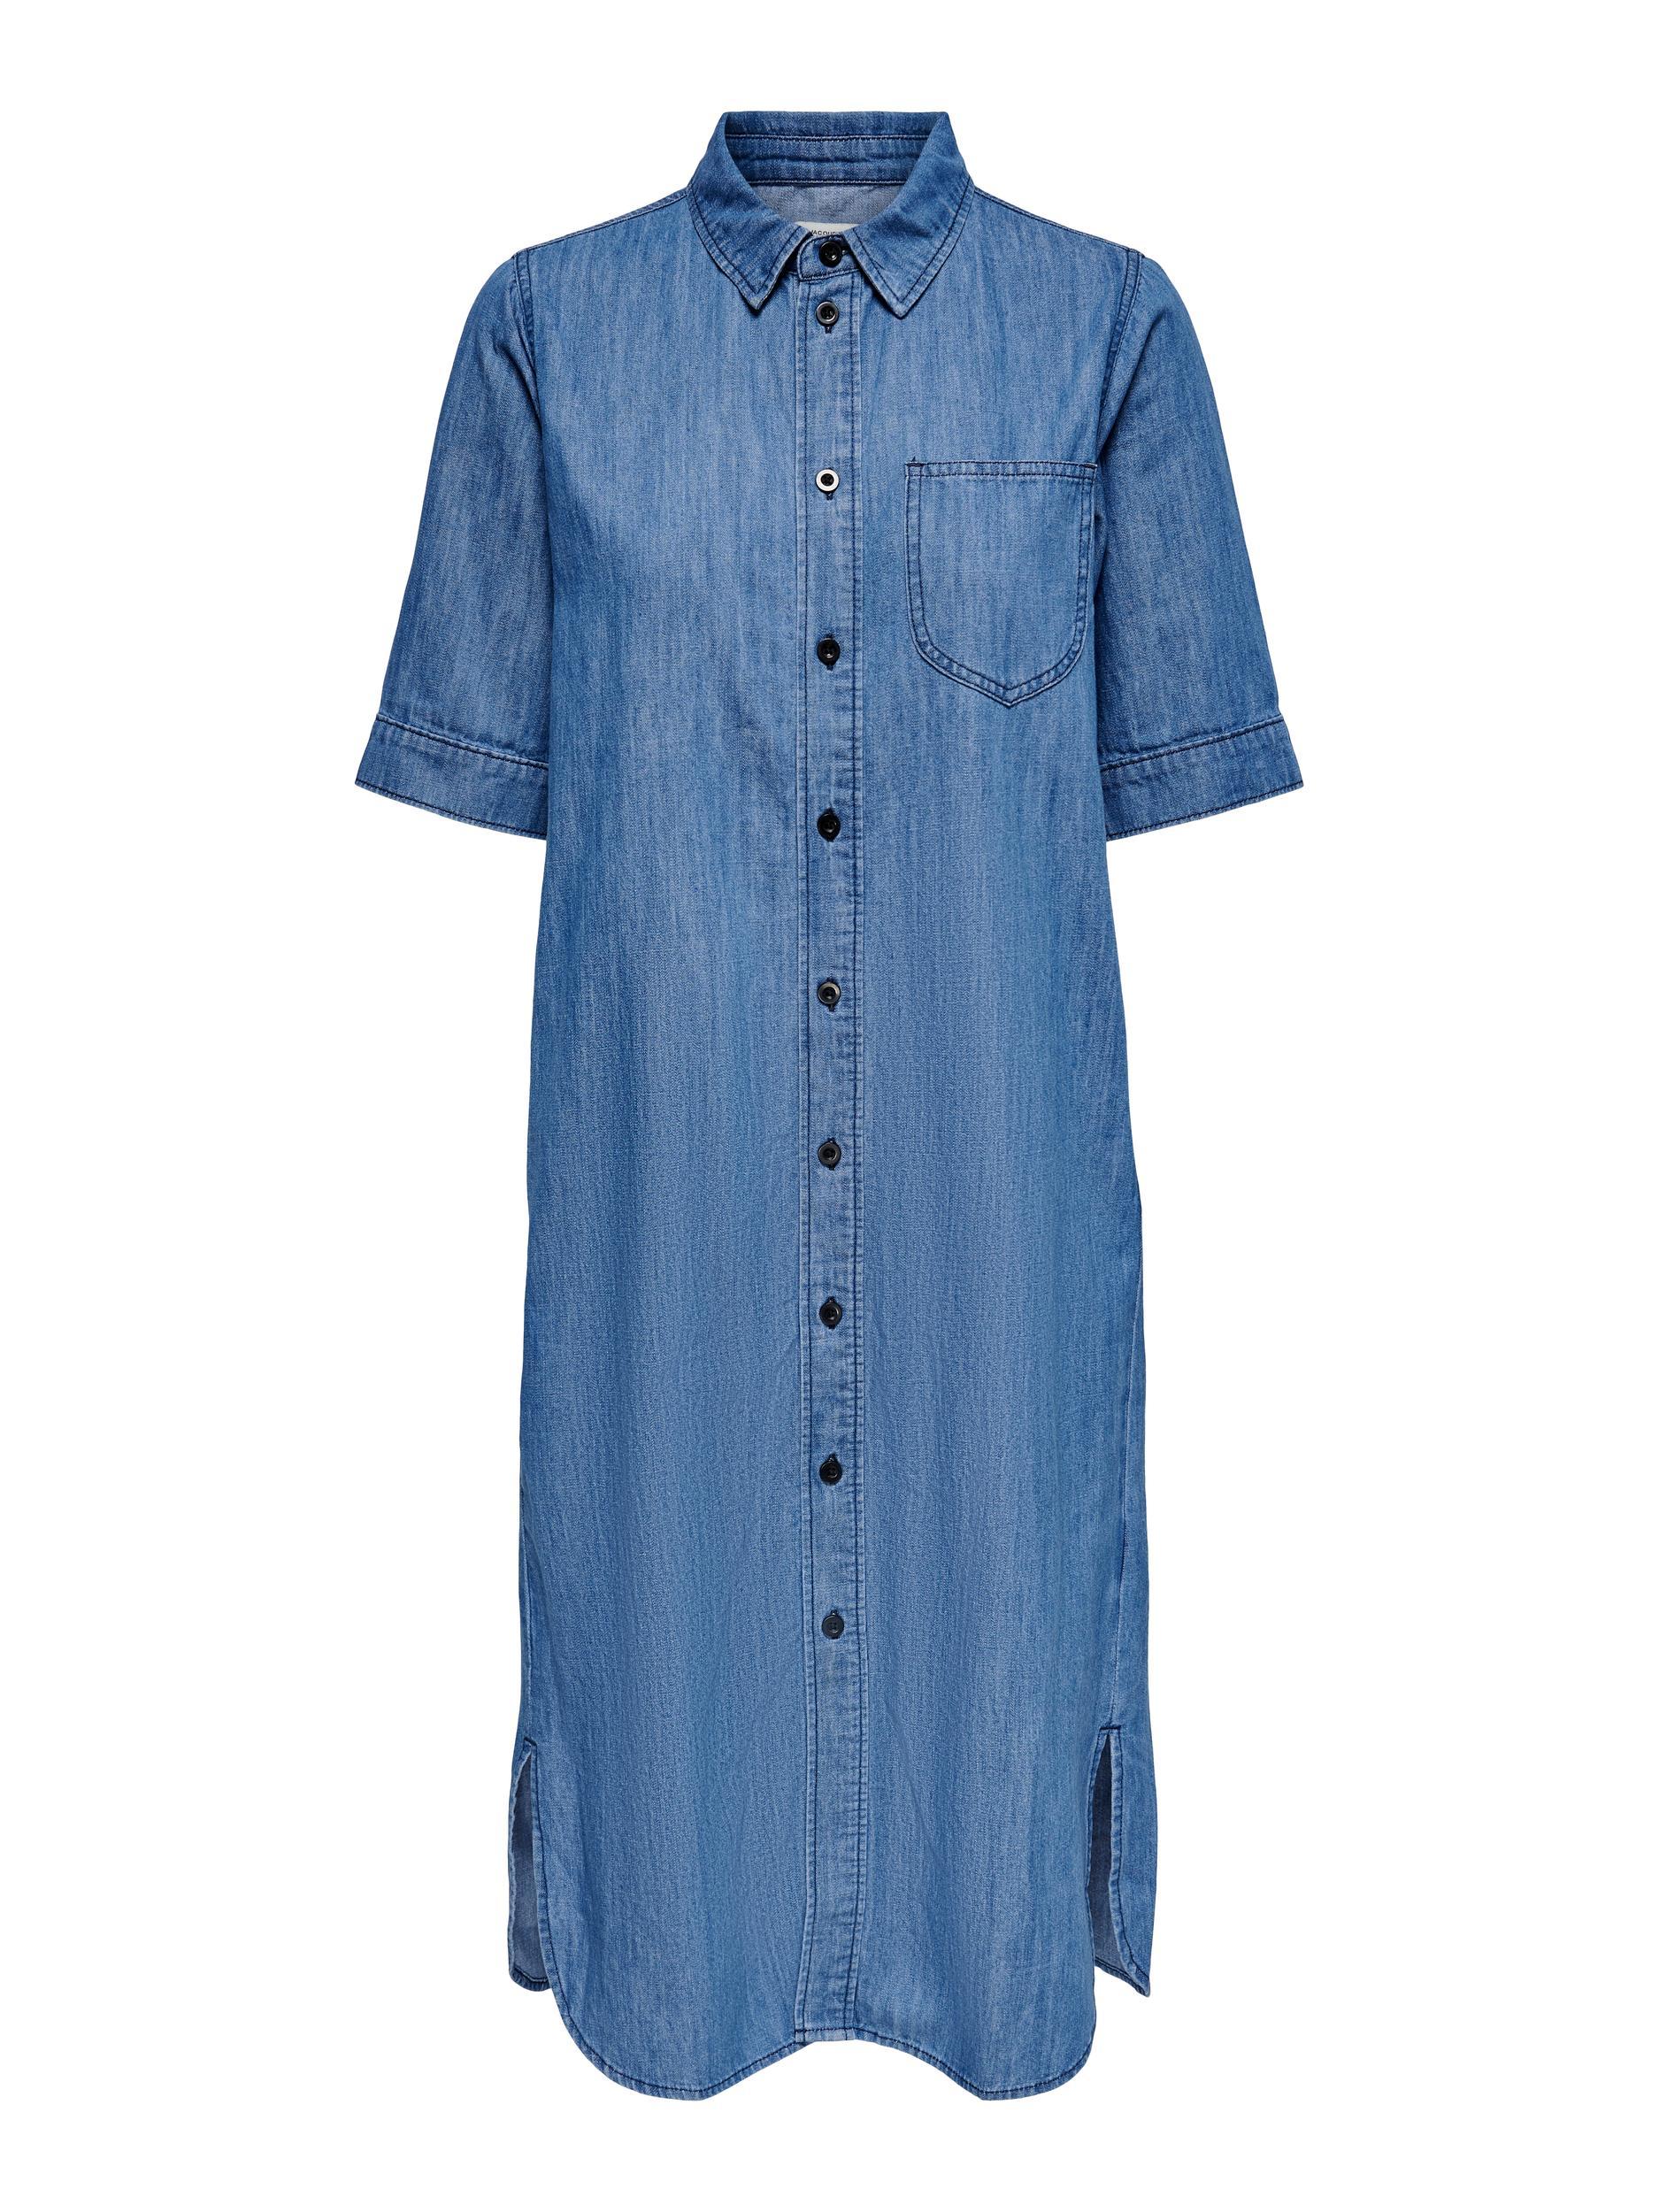 Jacqueline de Yong Poppy kjole